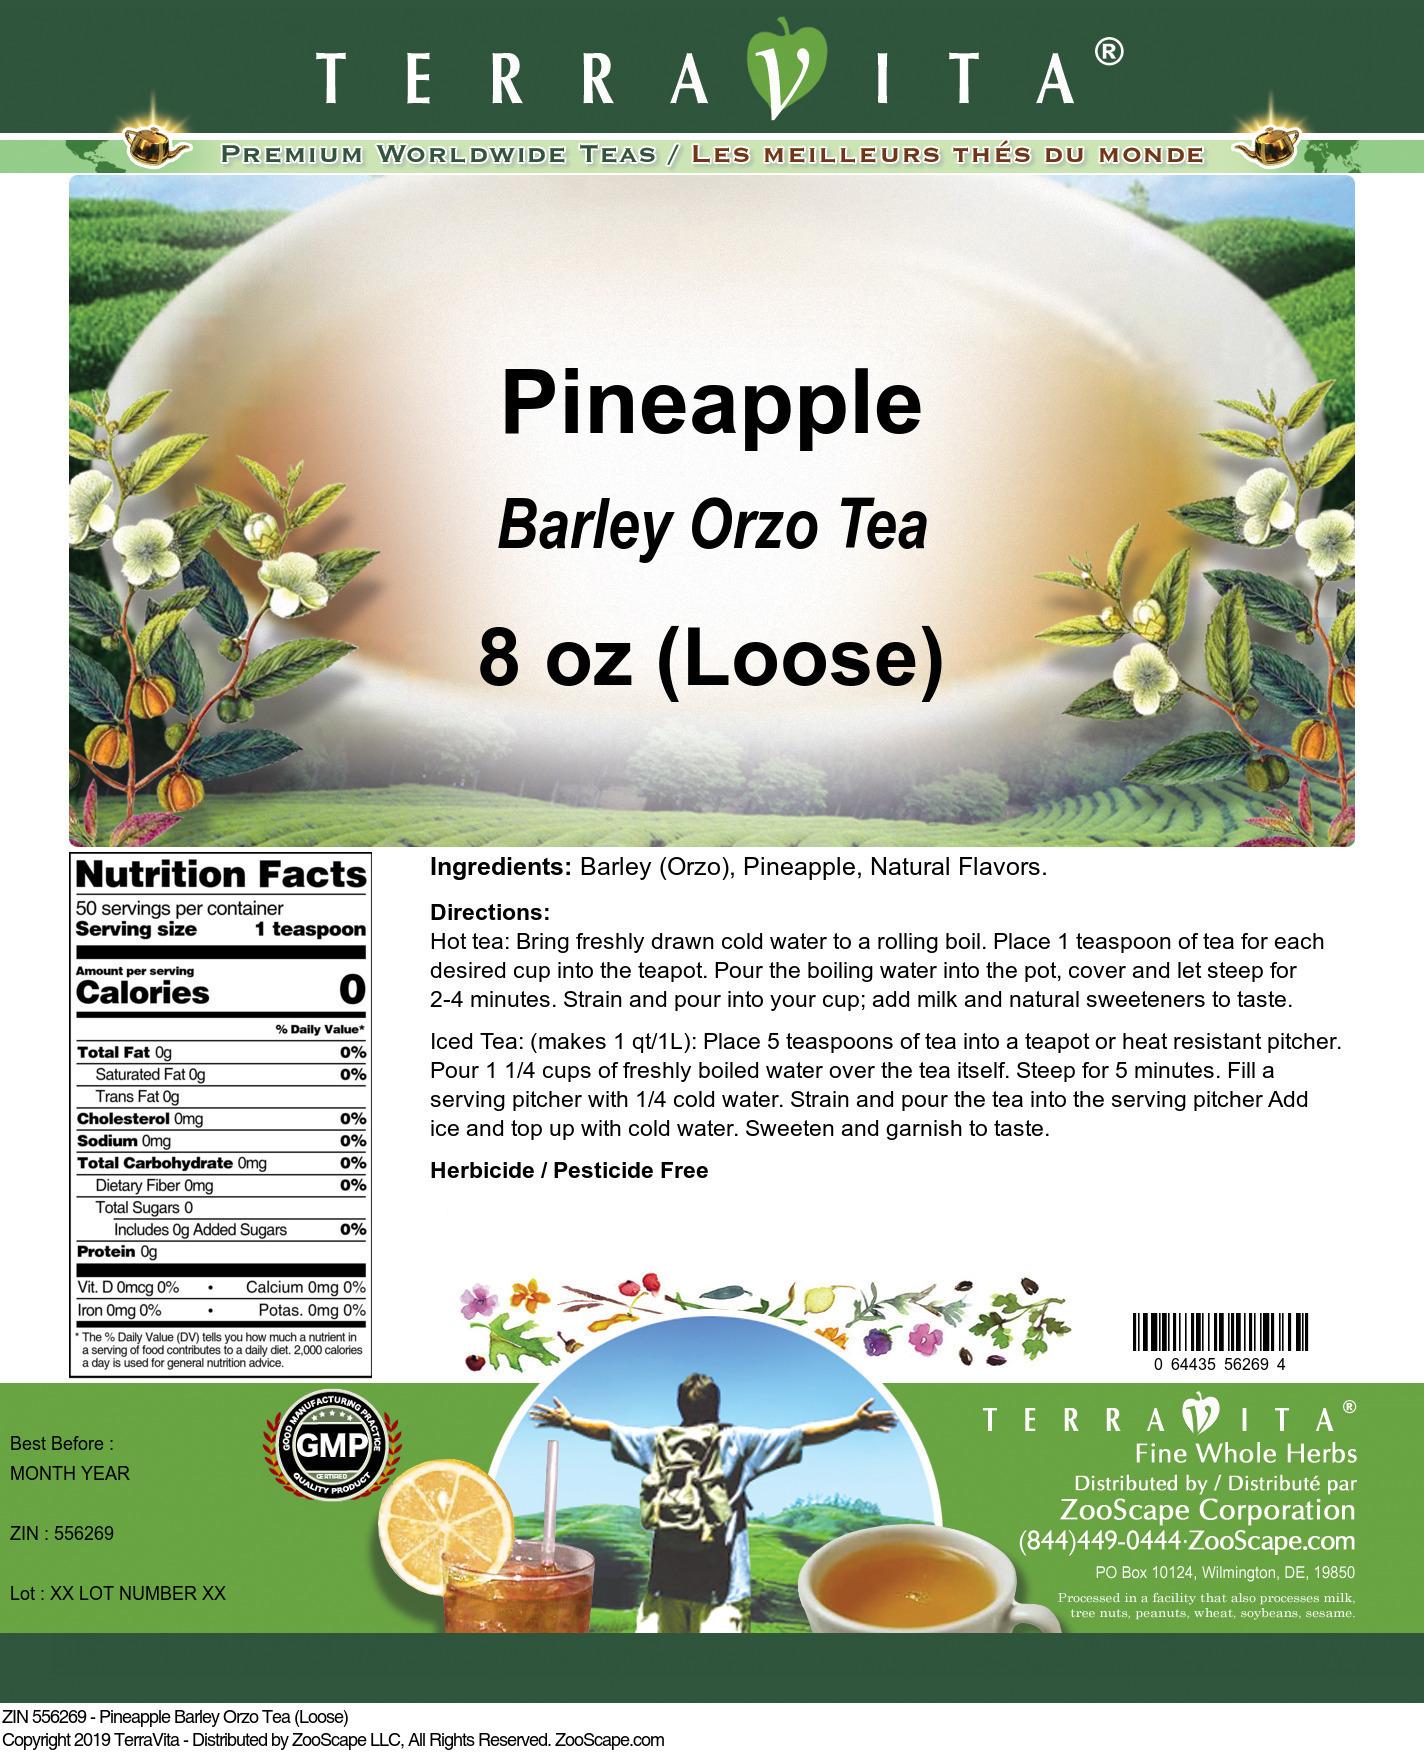 Pineapple Barley Orzo